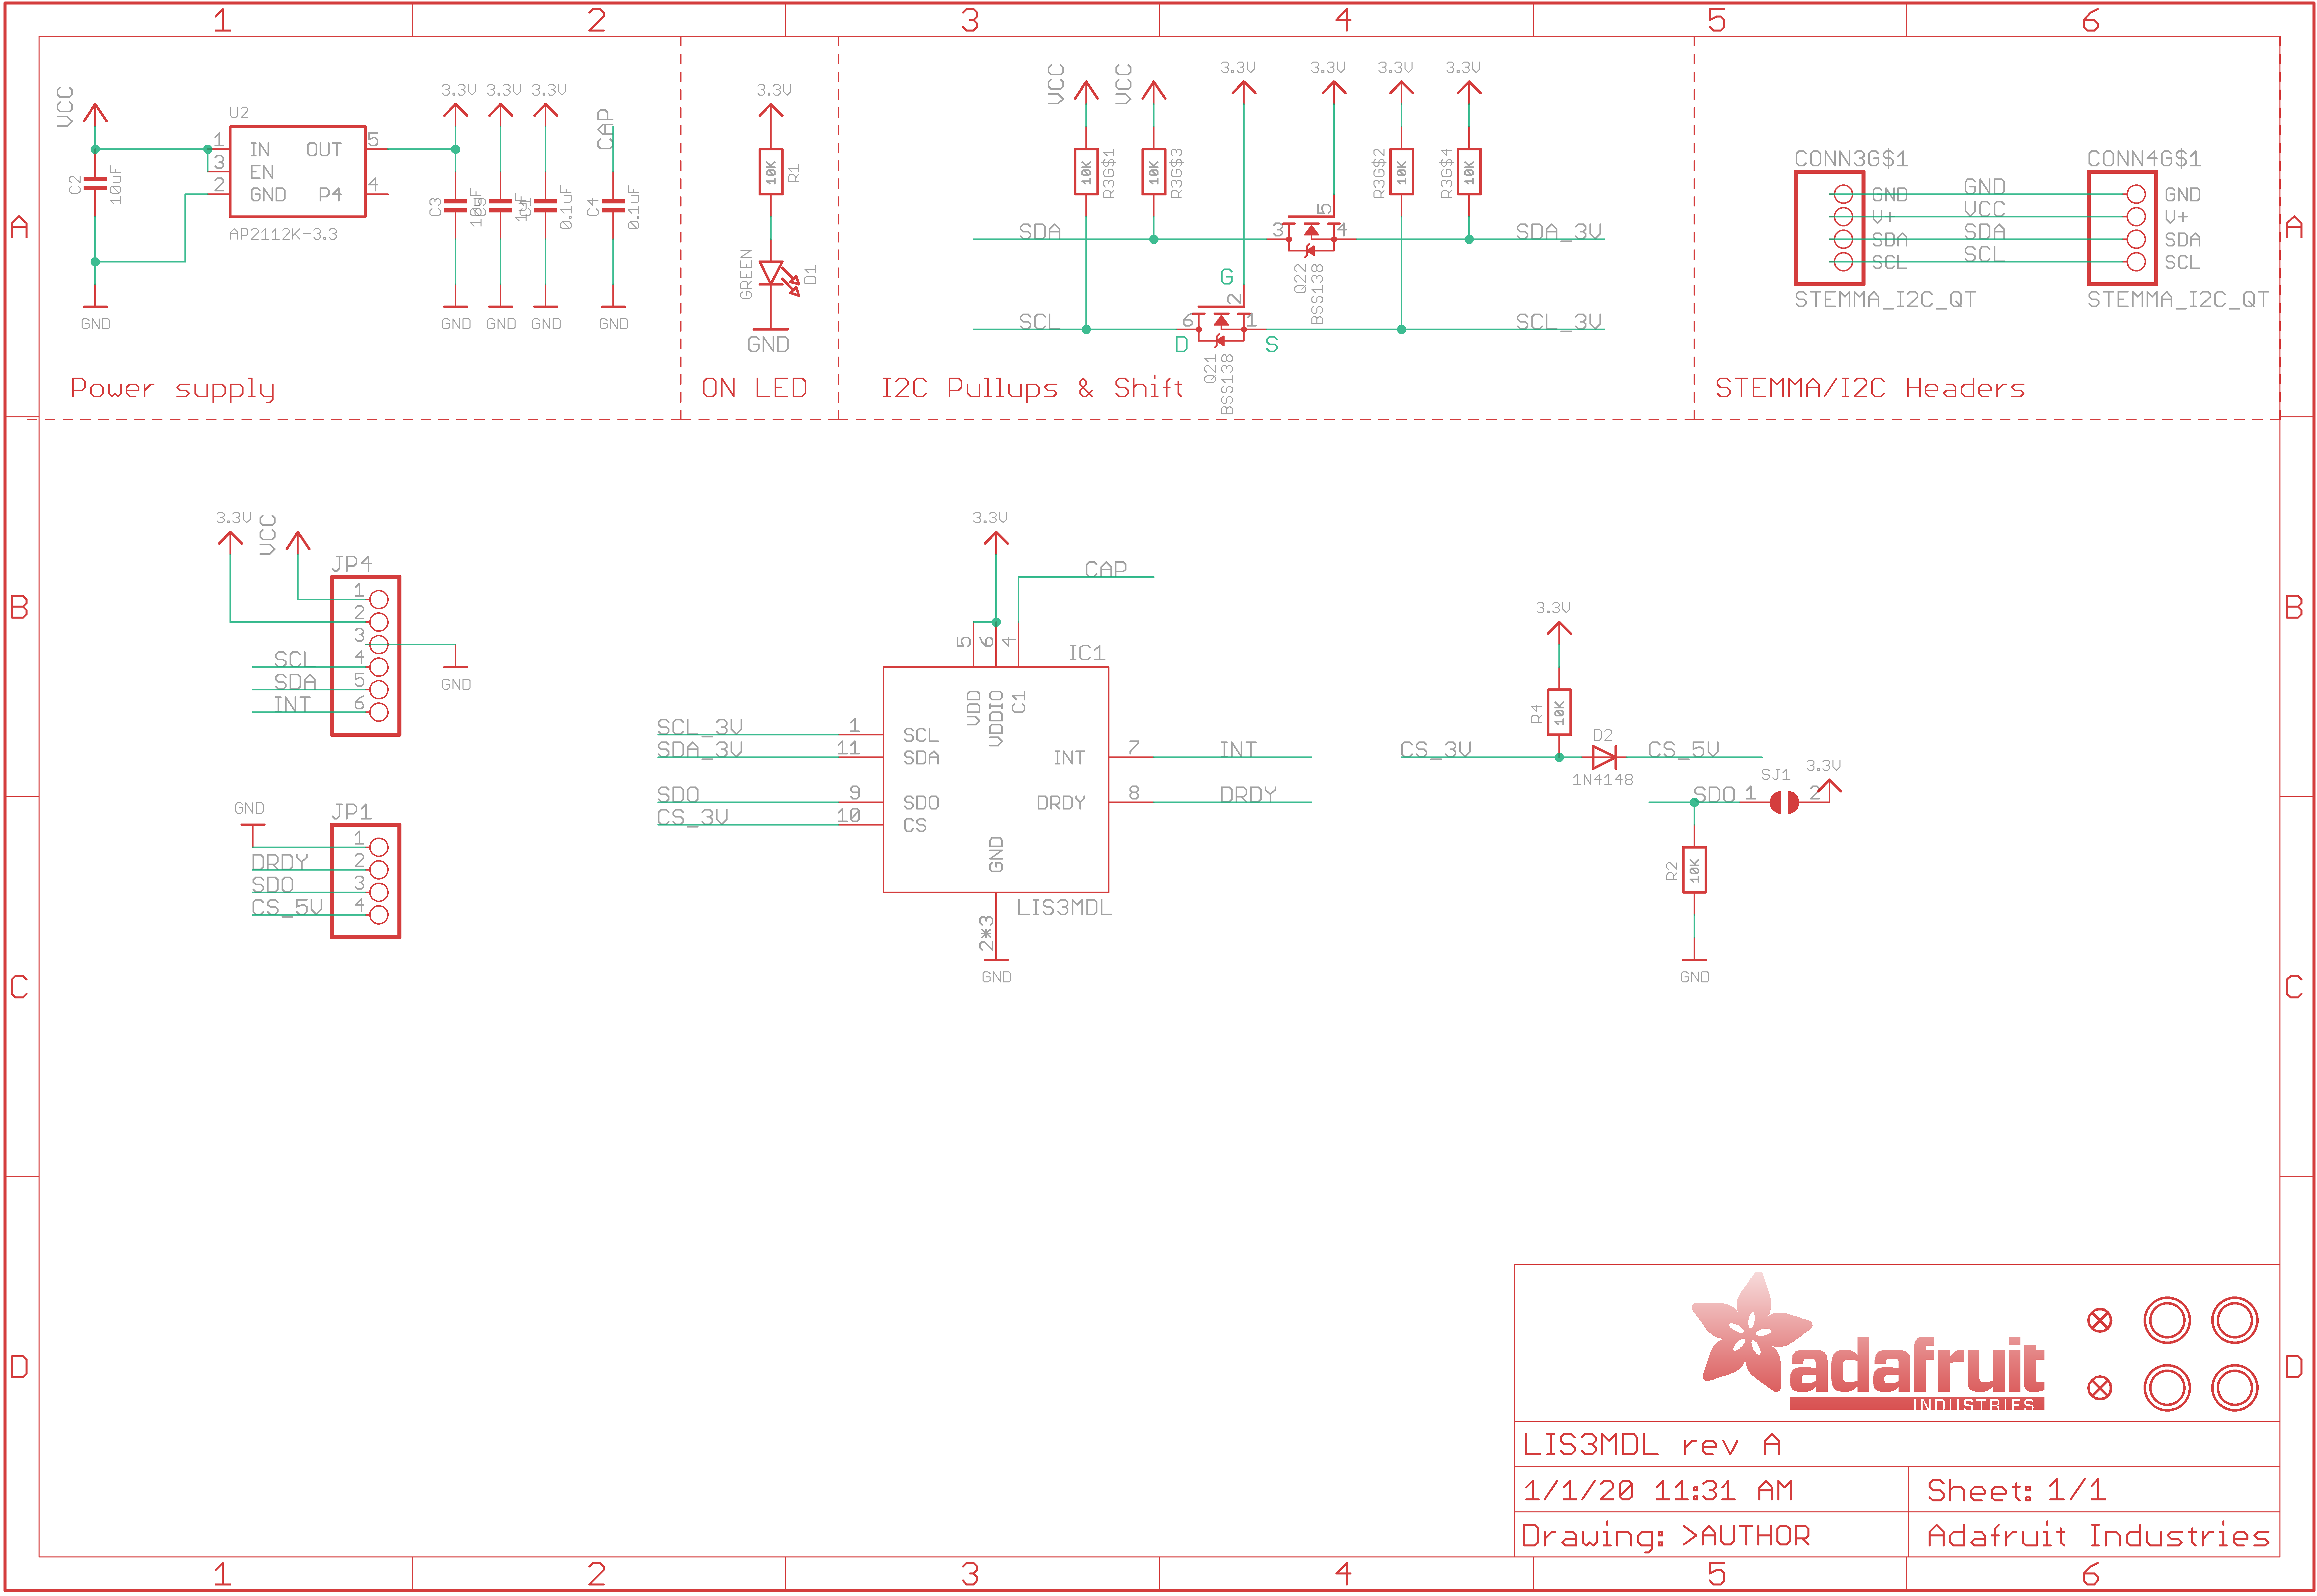 sensors_downloads_schematic.png